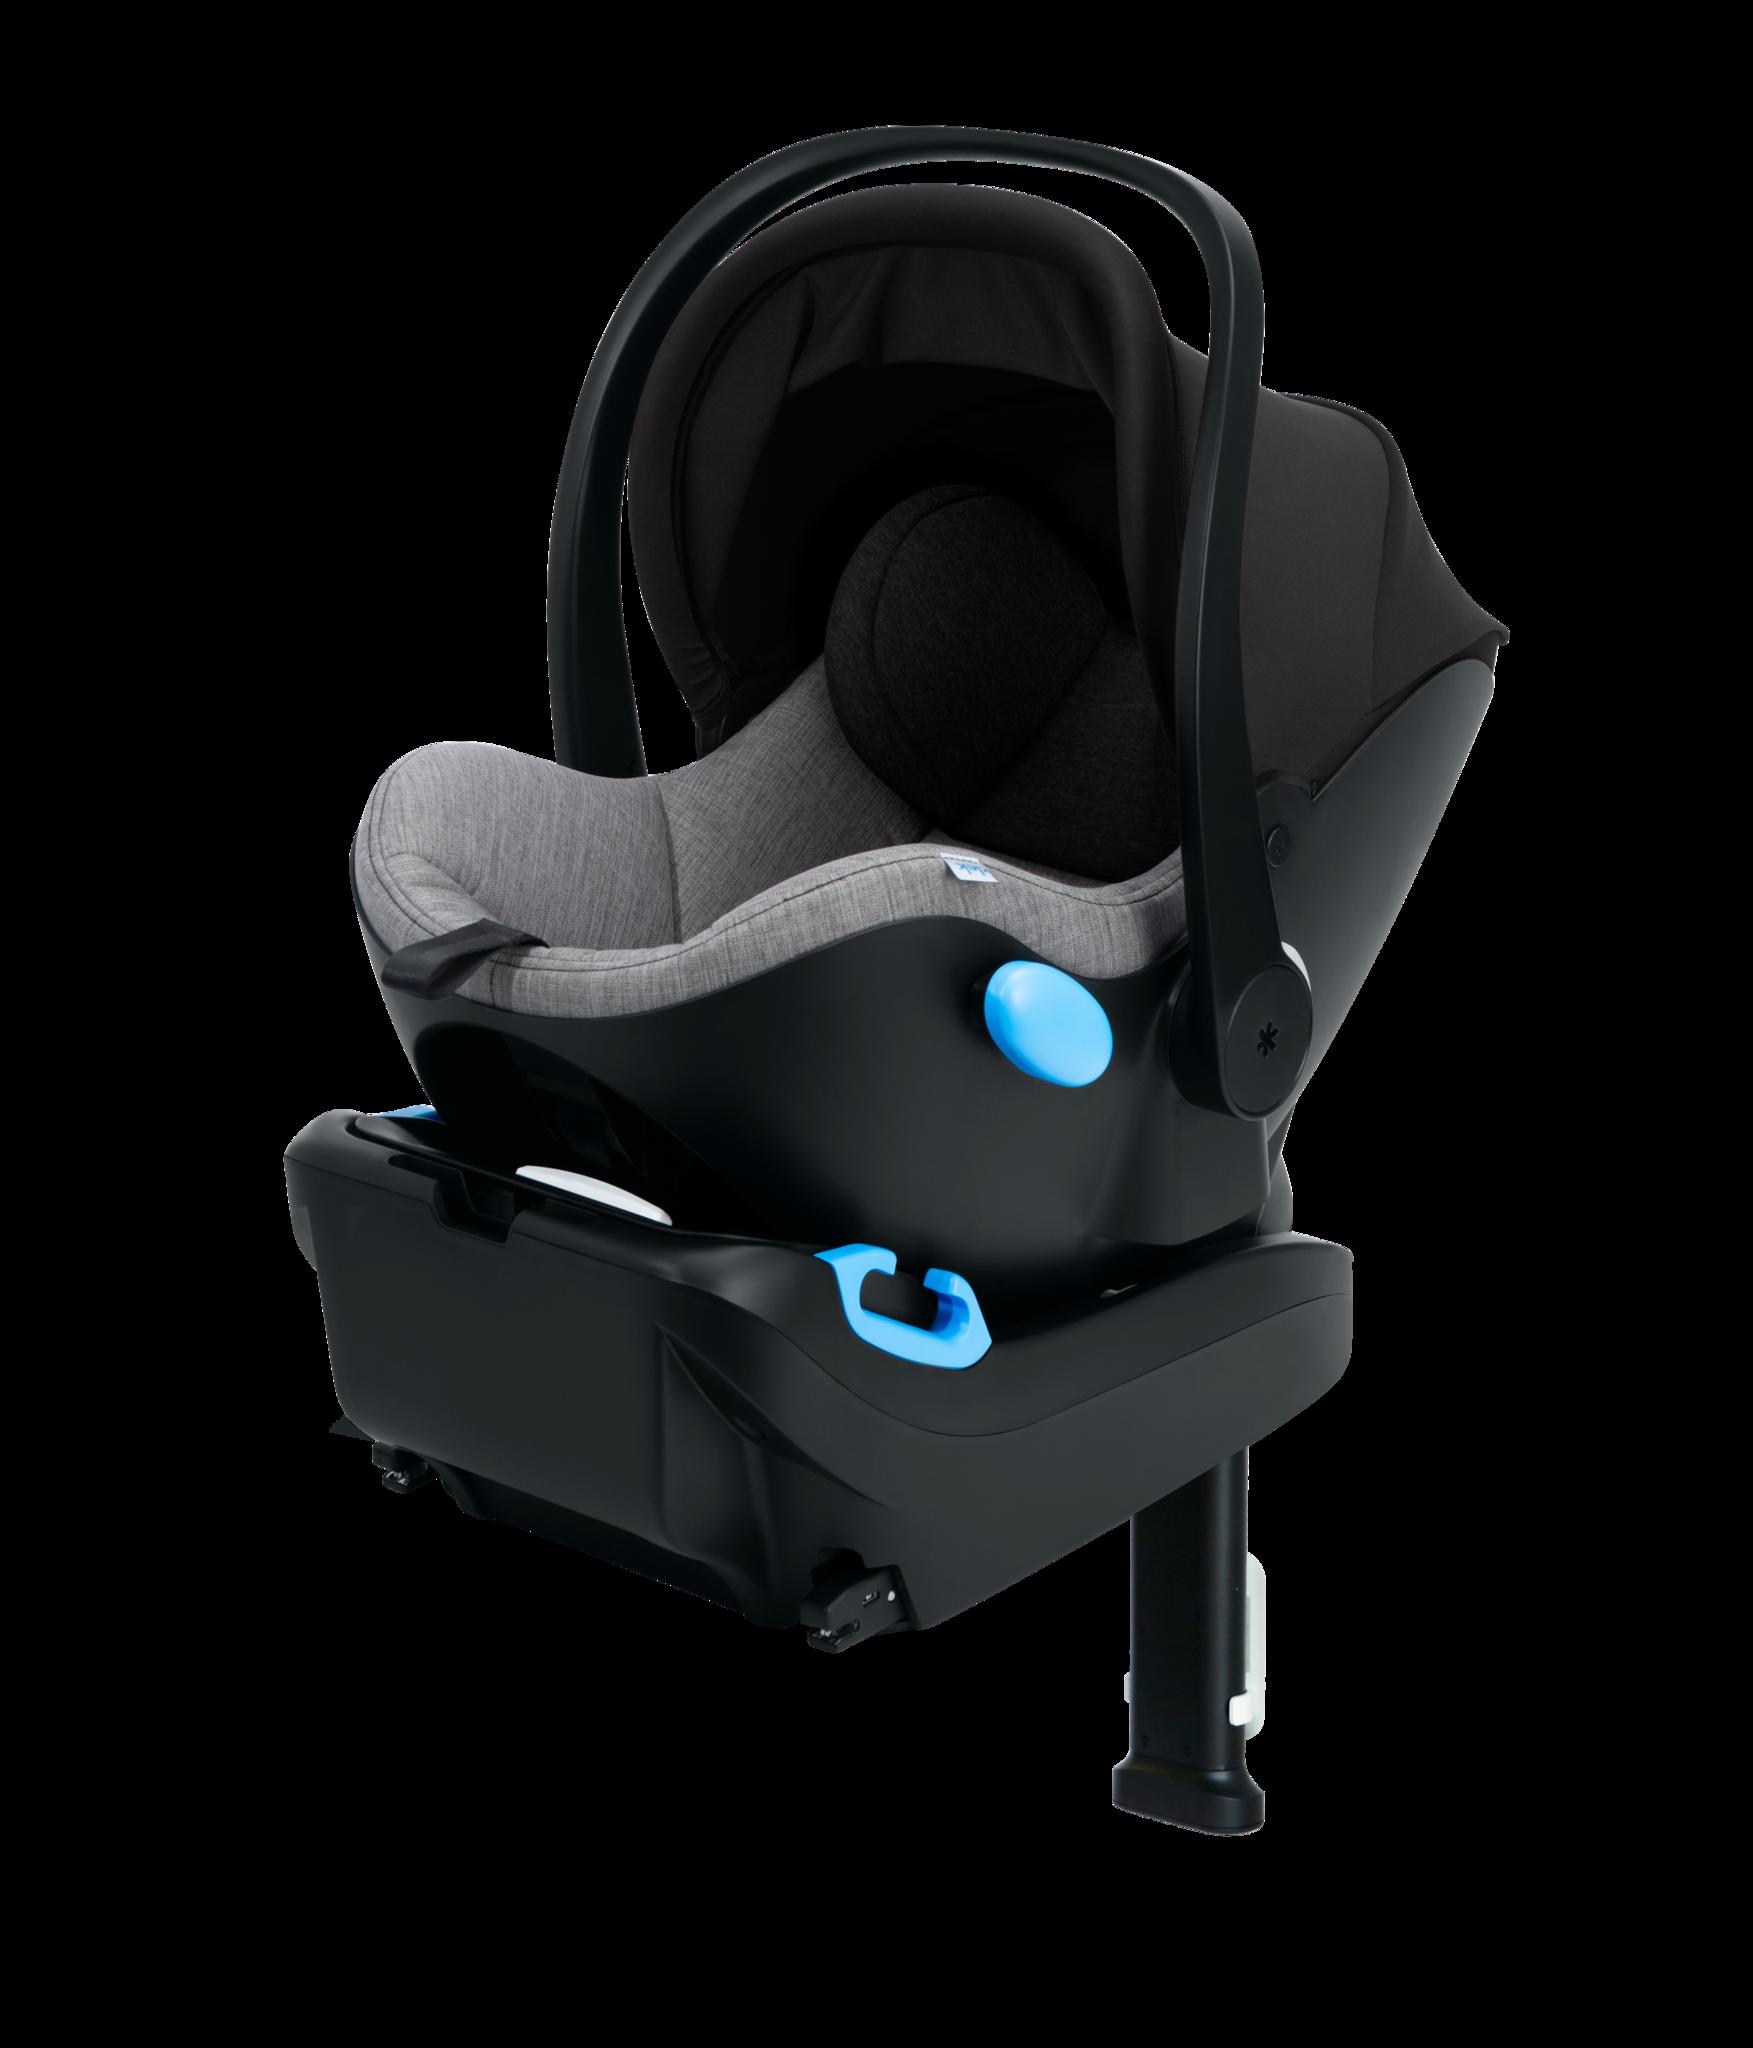 Clek Clek liing infant seat (preorder for July)